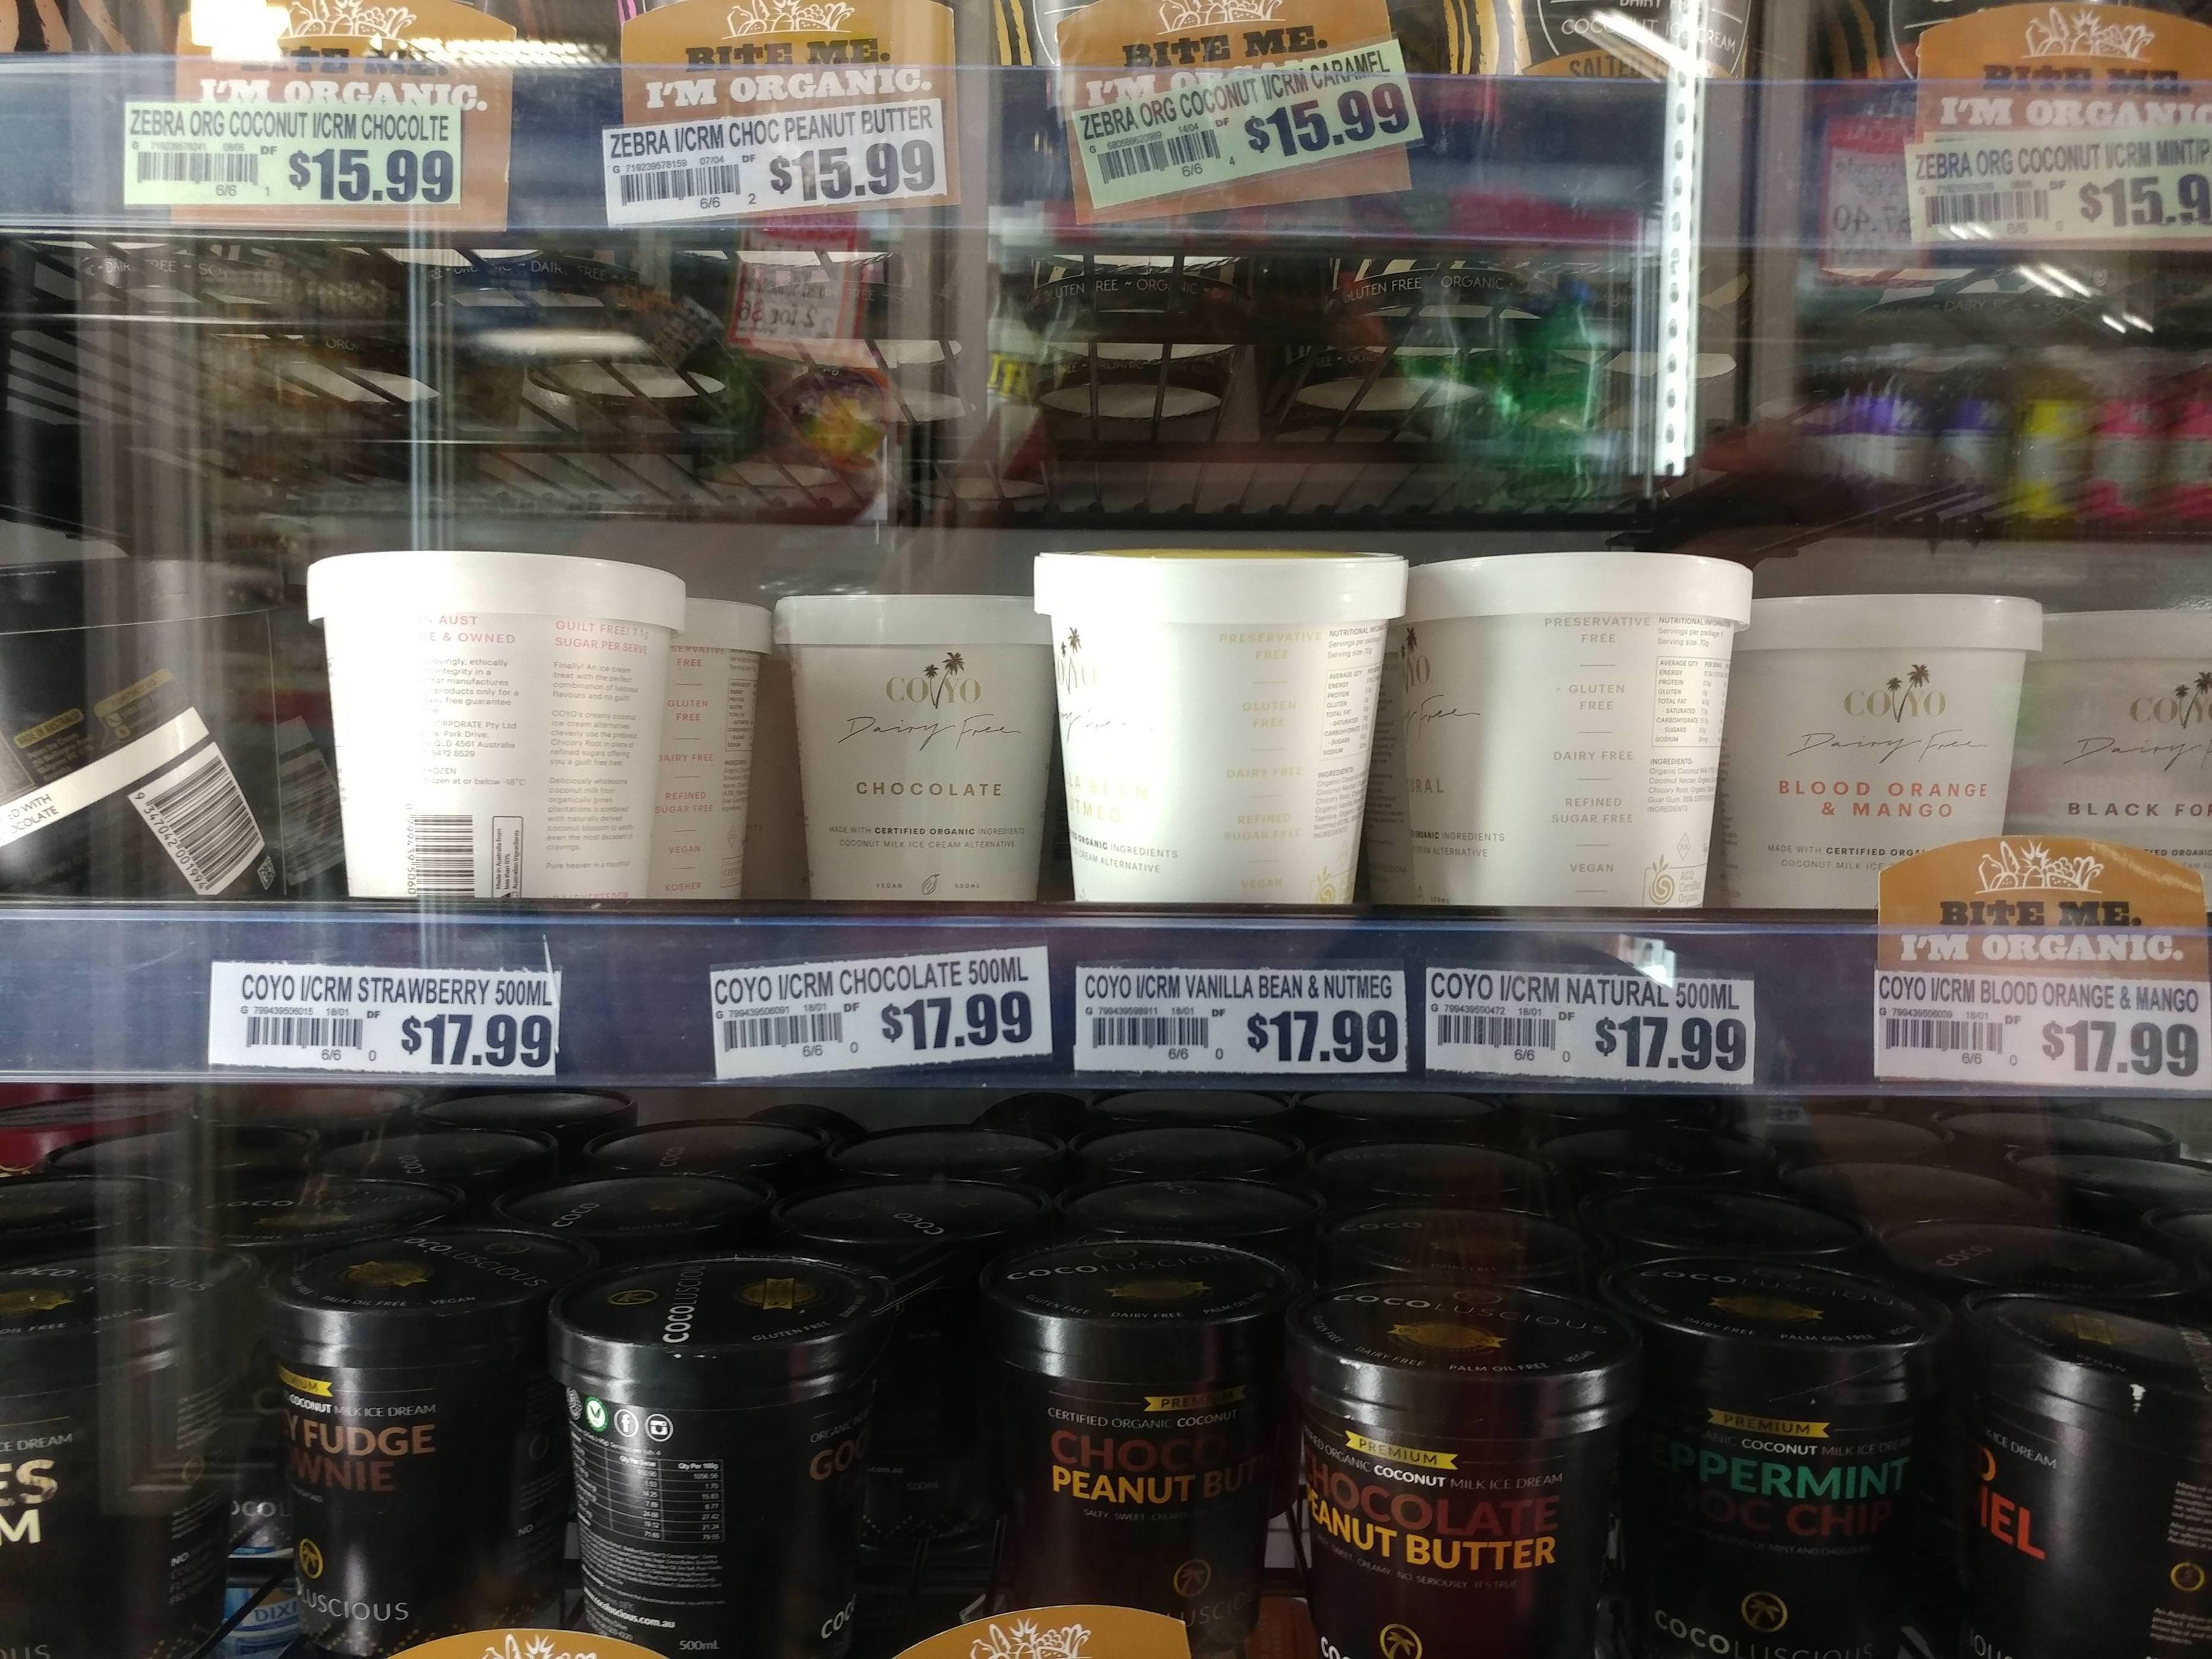 Coconut icecream in Australia is like